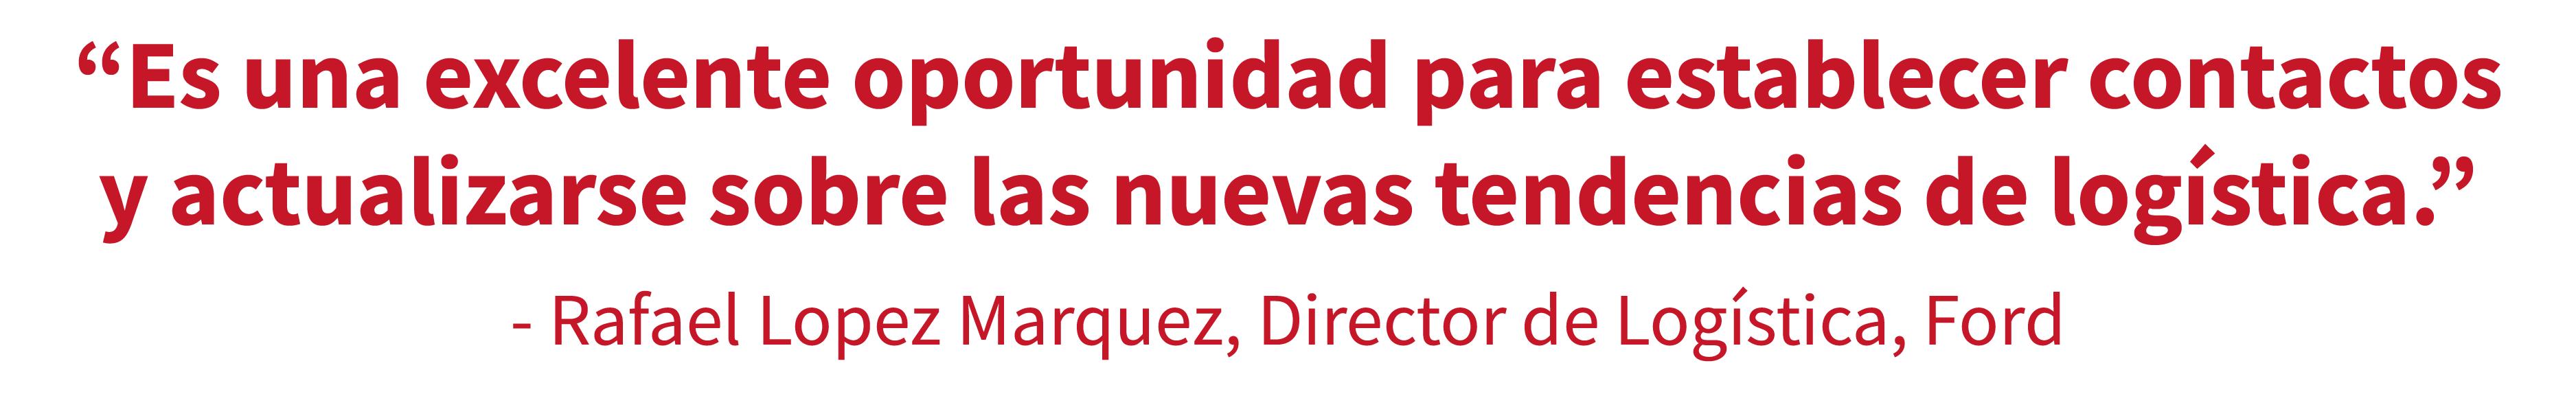 MexicoQuotes_Red_ES